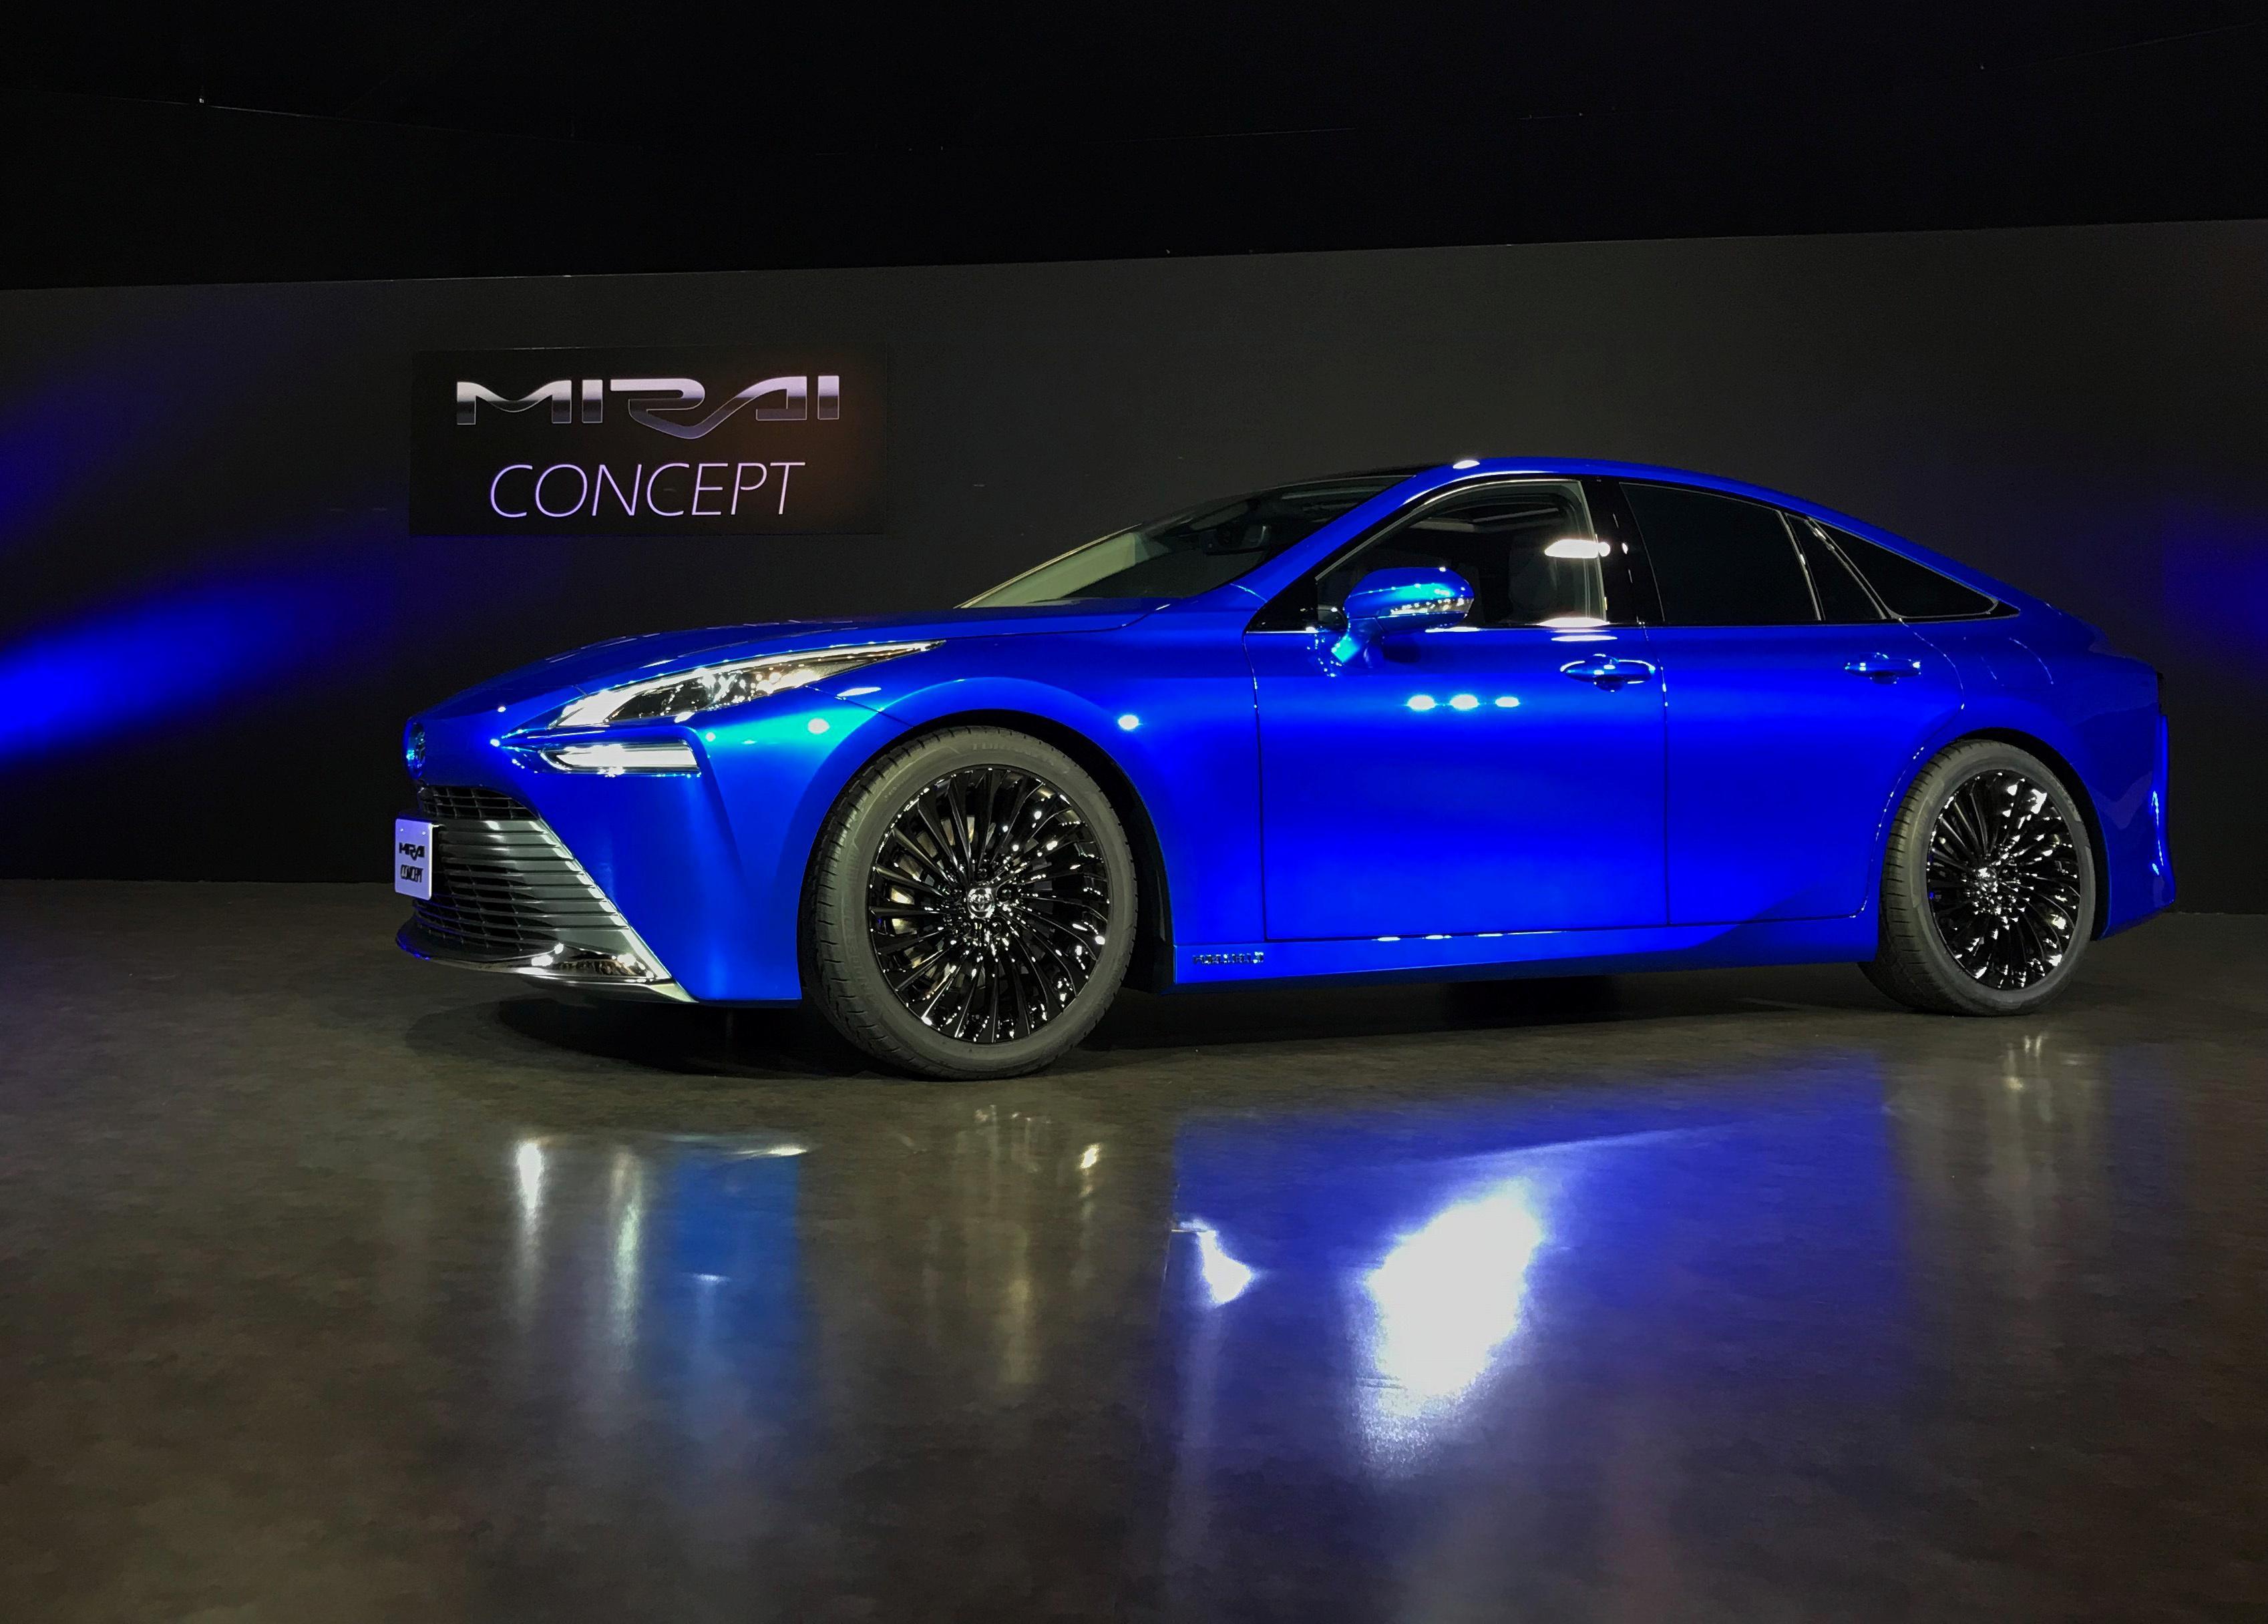 Toyota unveils revamped hydrogen sedan to take on Tesla